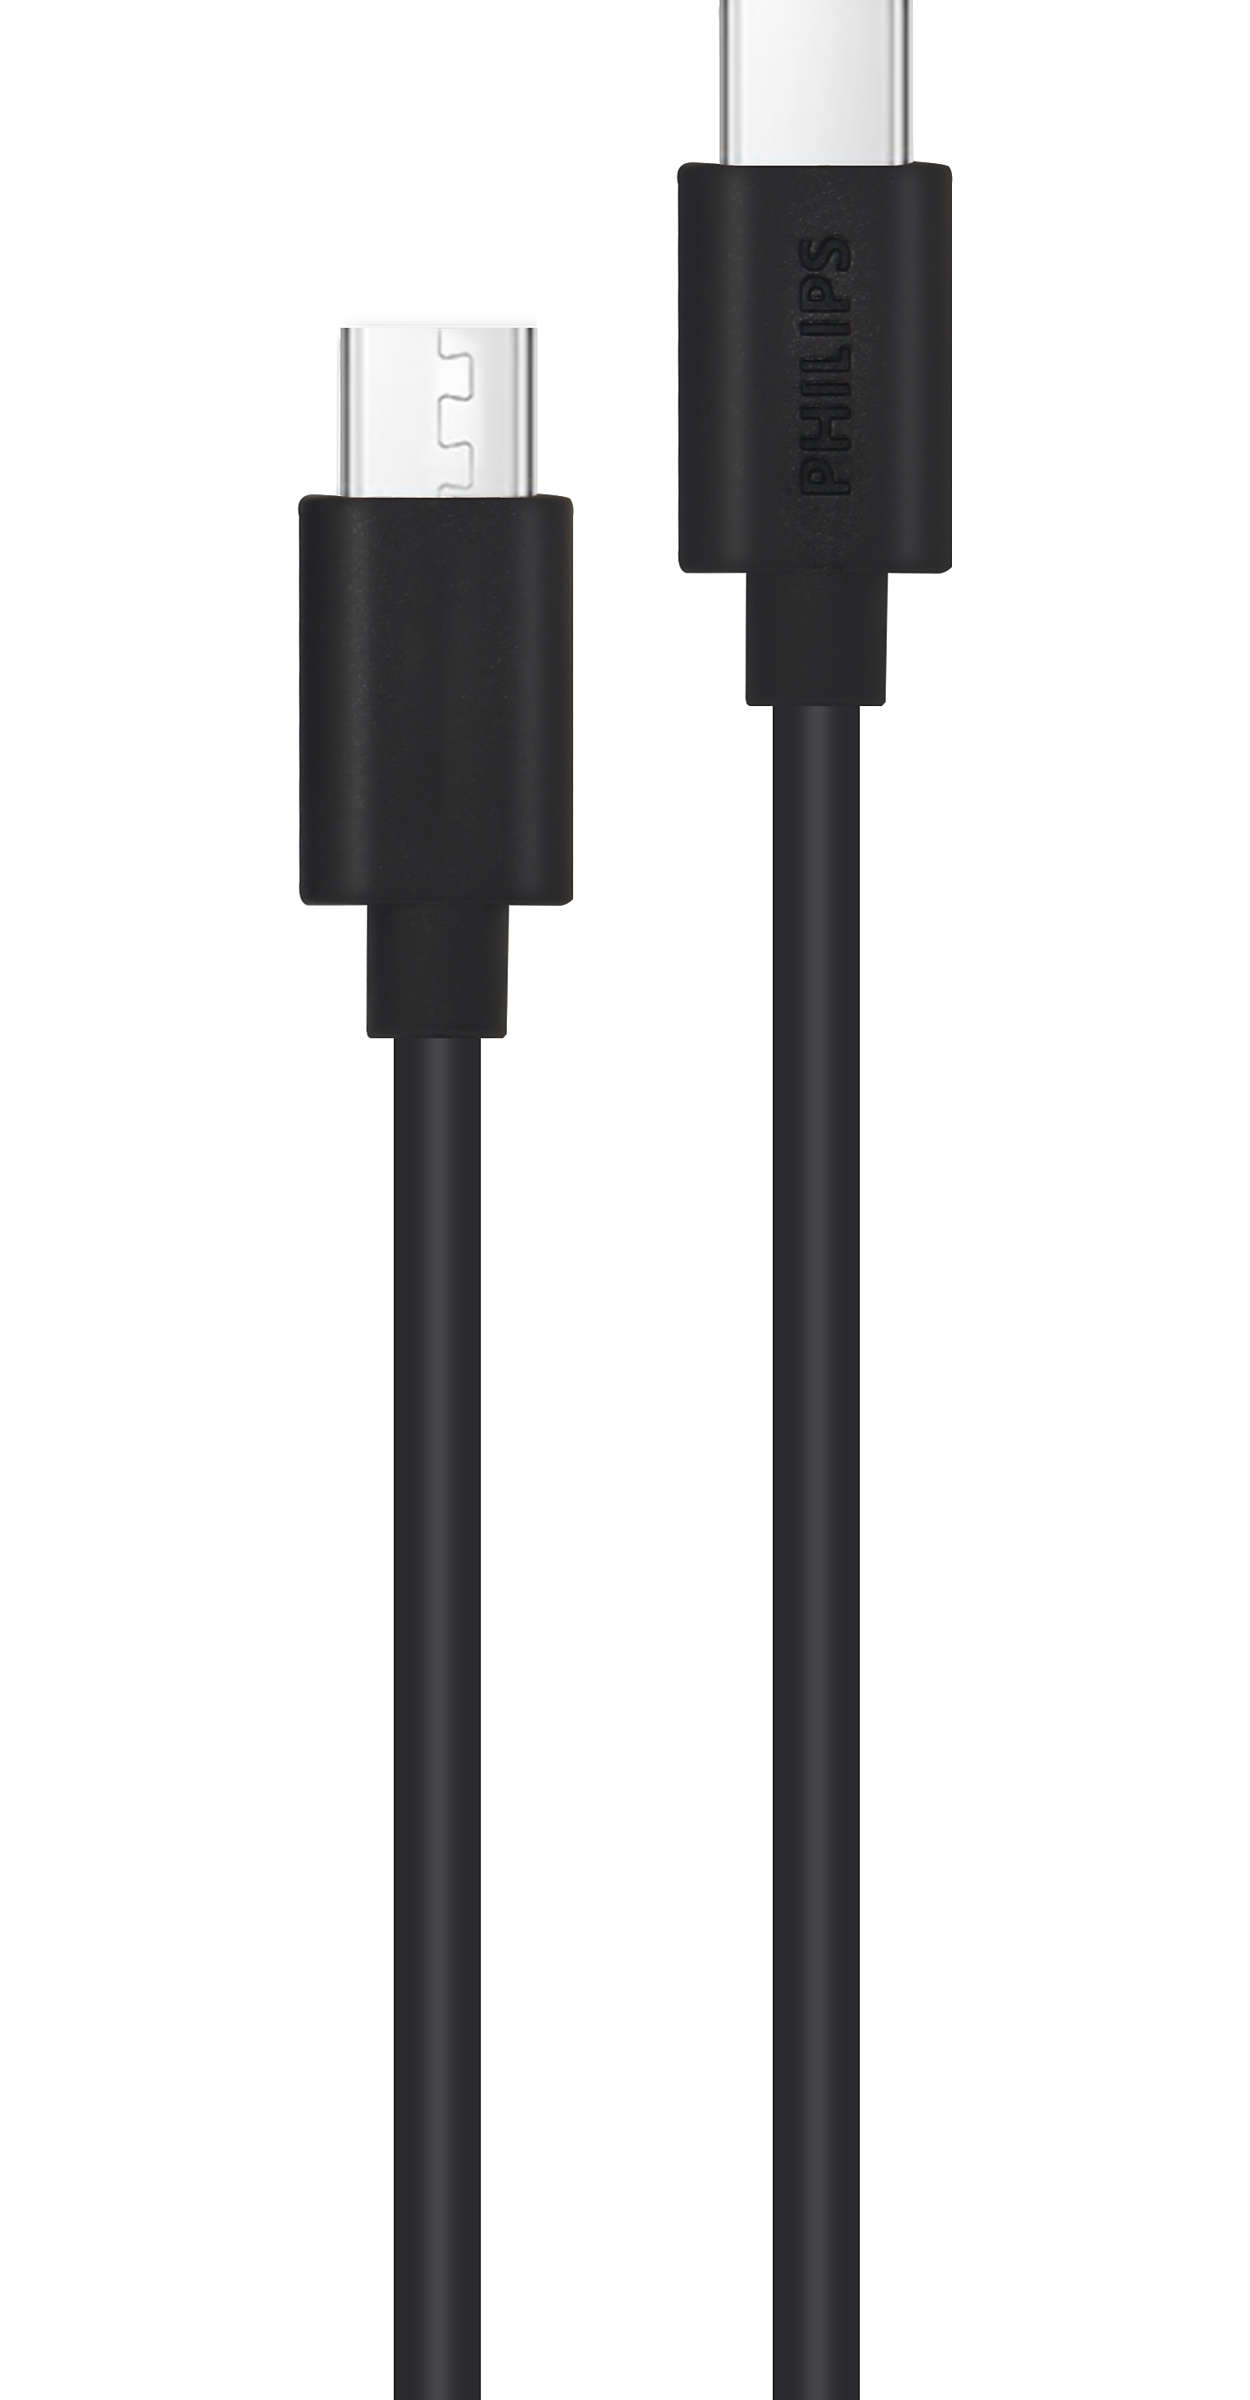 2 米 USB-C 至 USB-C 线缆